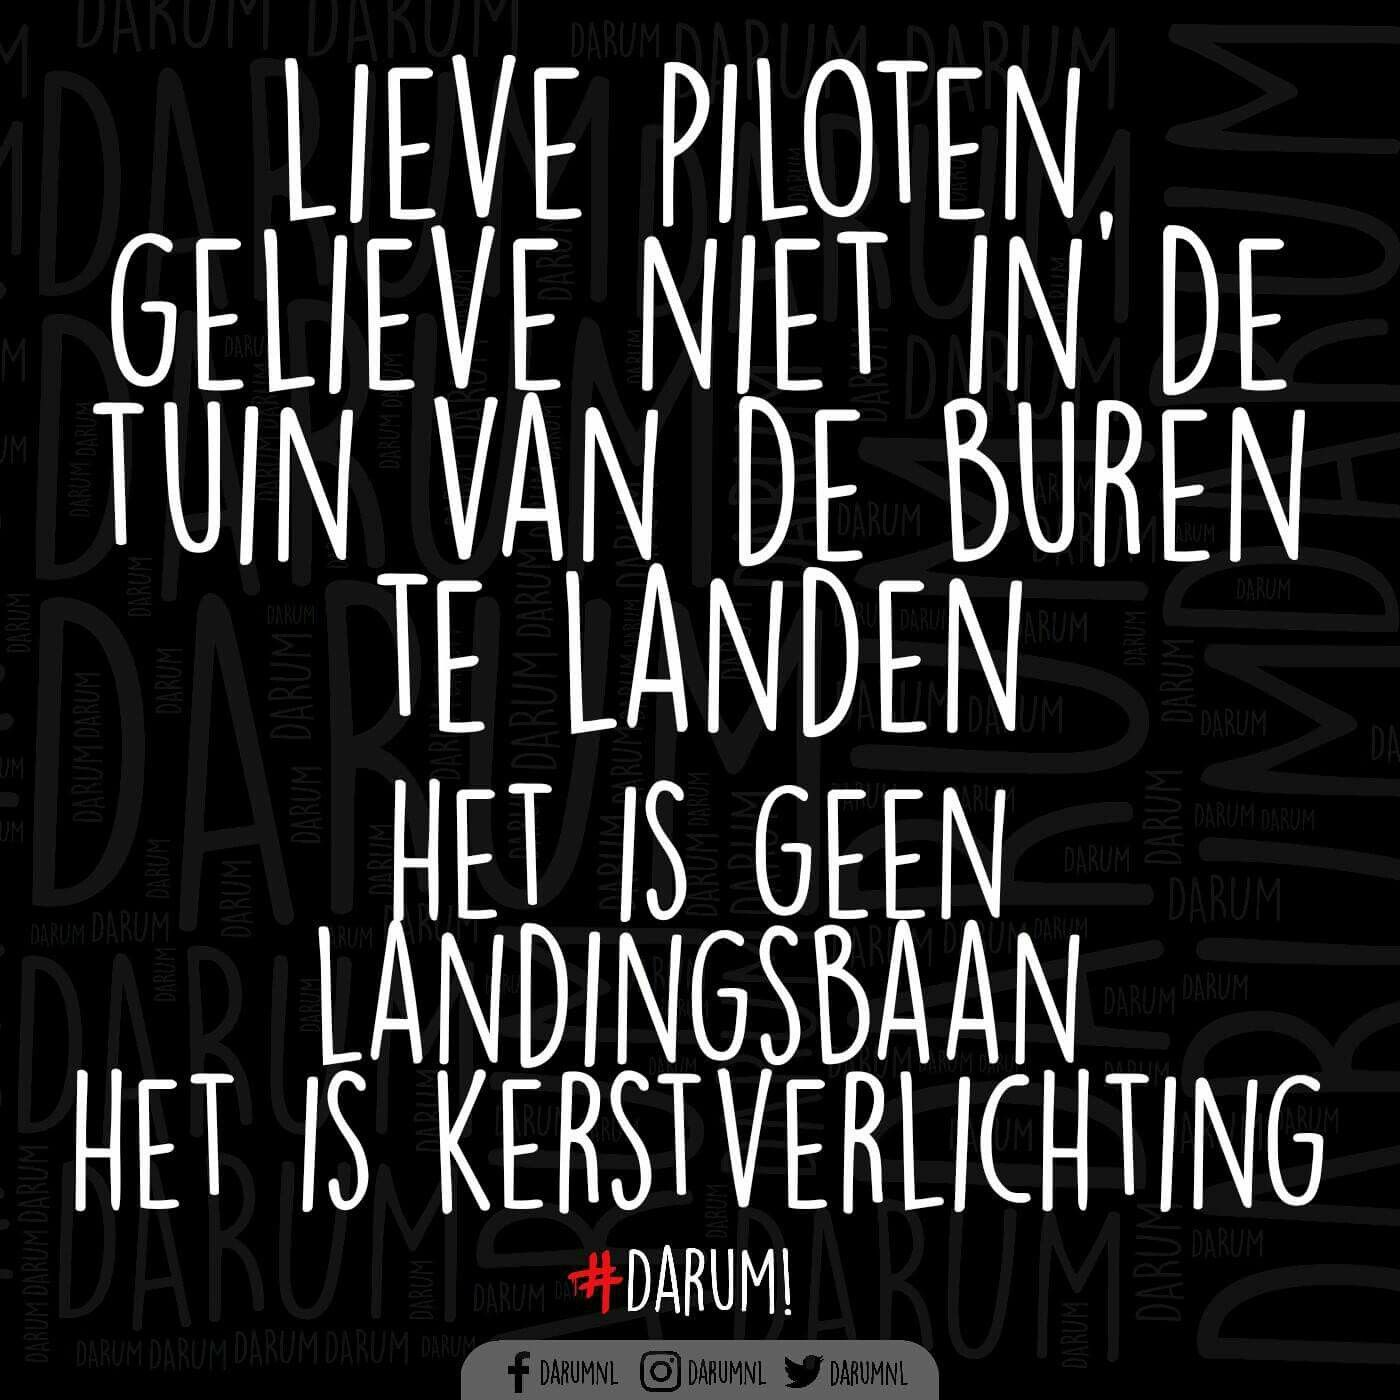 Citaten Humor Jorok : Alvast bedankt nederlandse dutch quotes pinterest